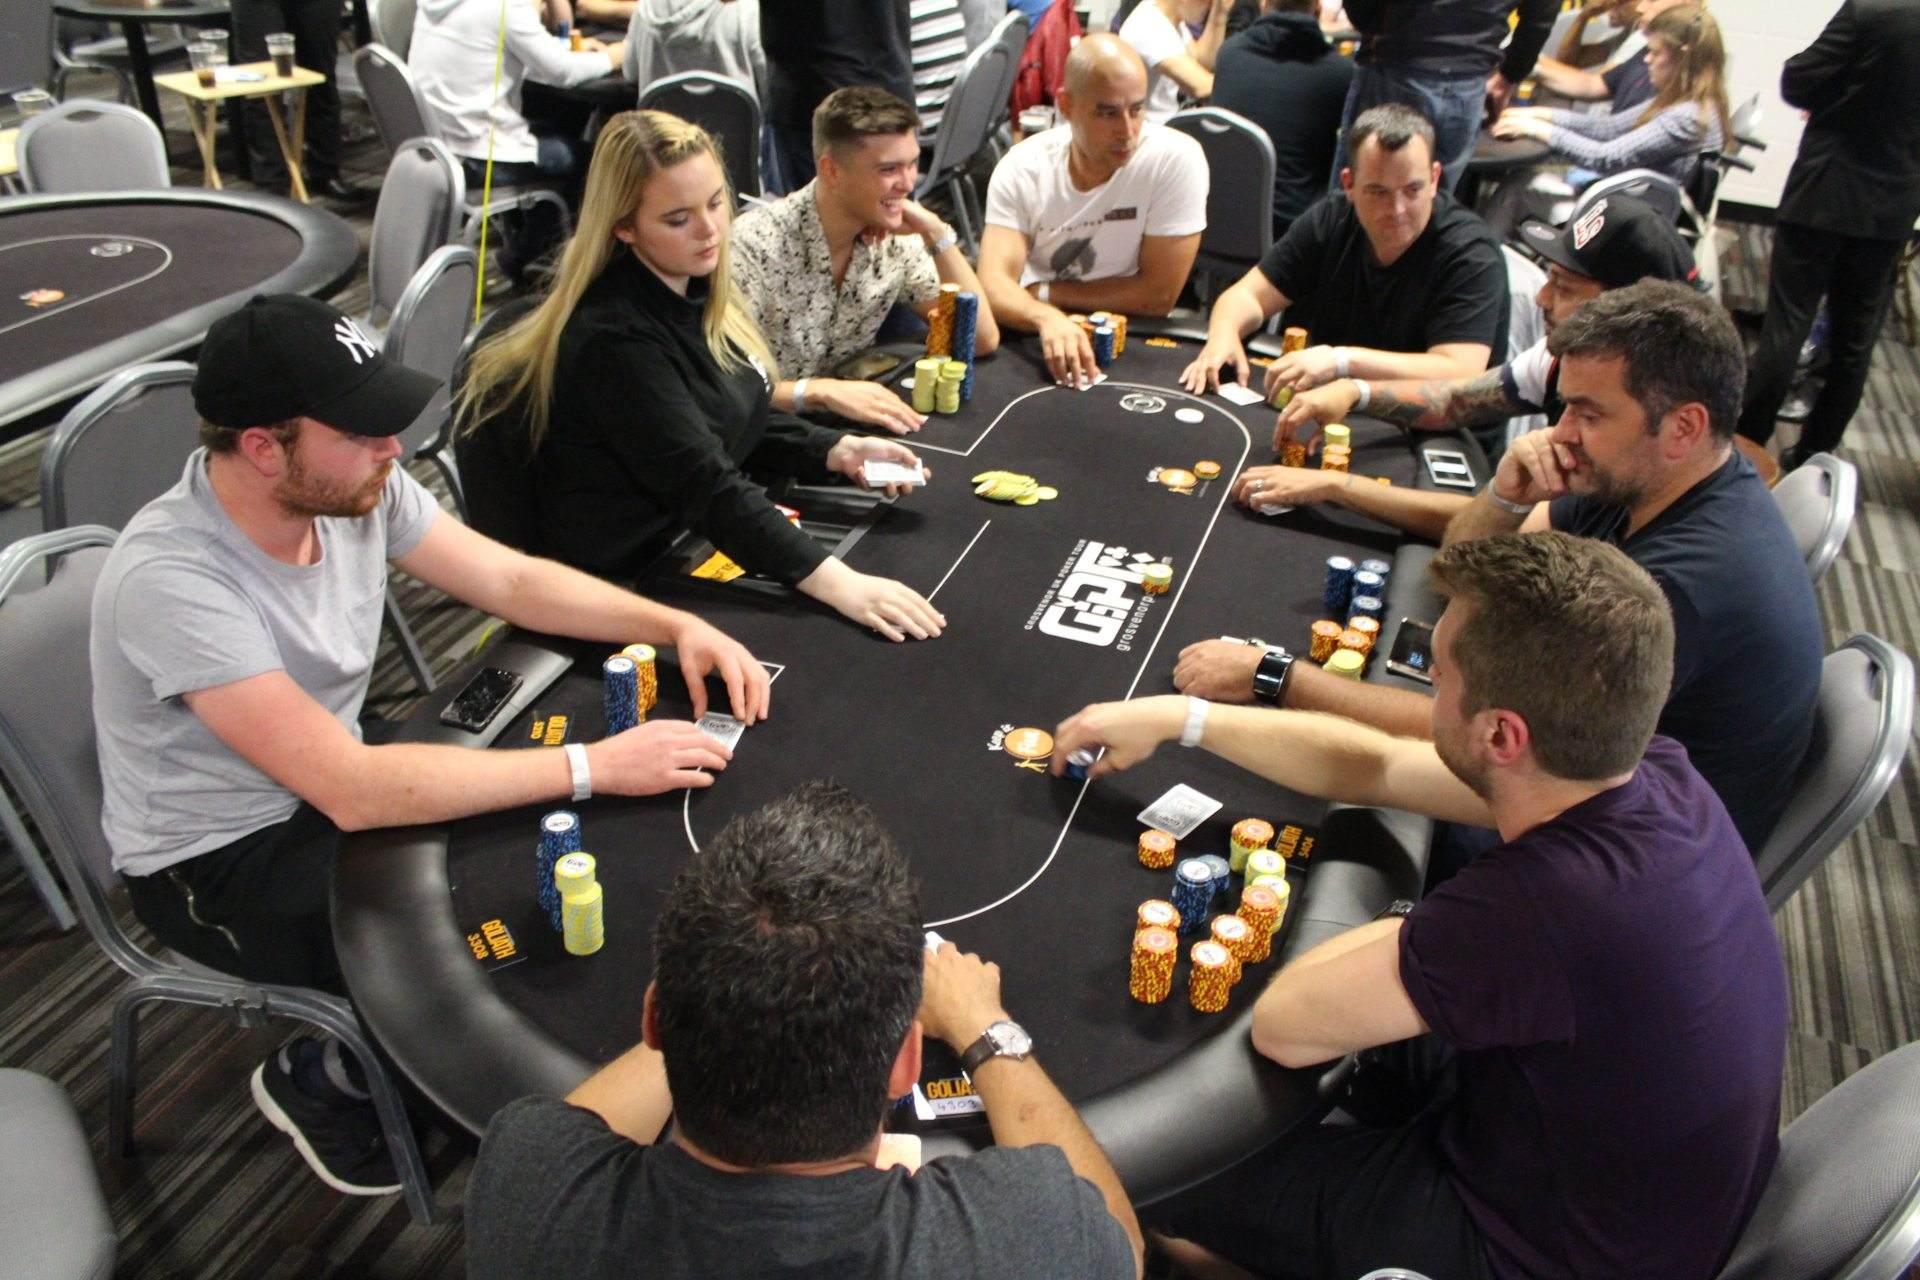 Wyatt frost poker miguel molina poker